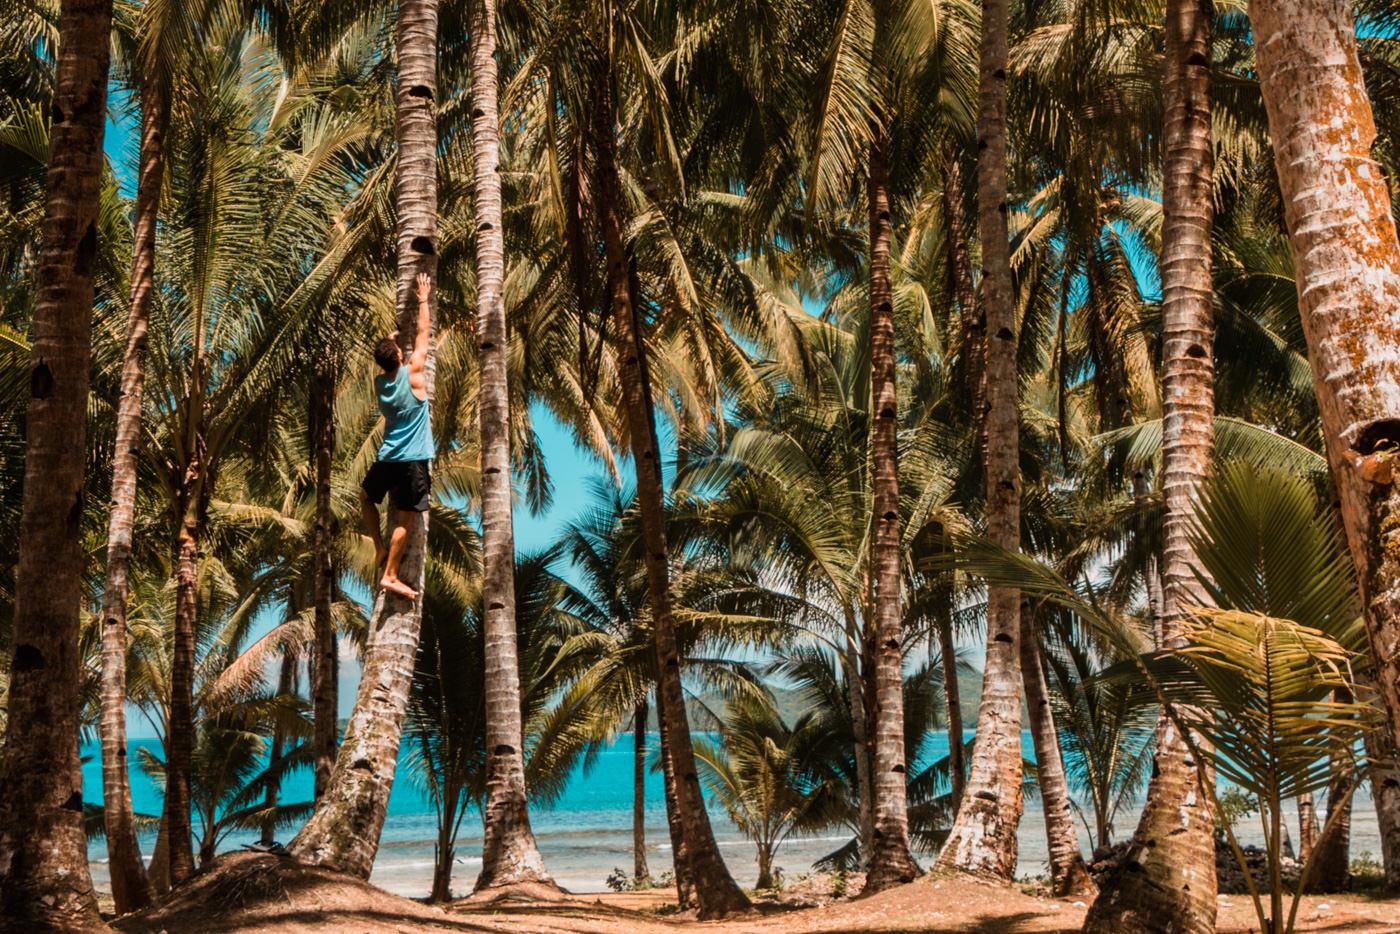 Secret Beach auf Siargao, Philippinen